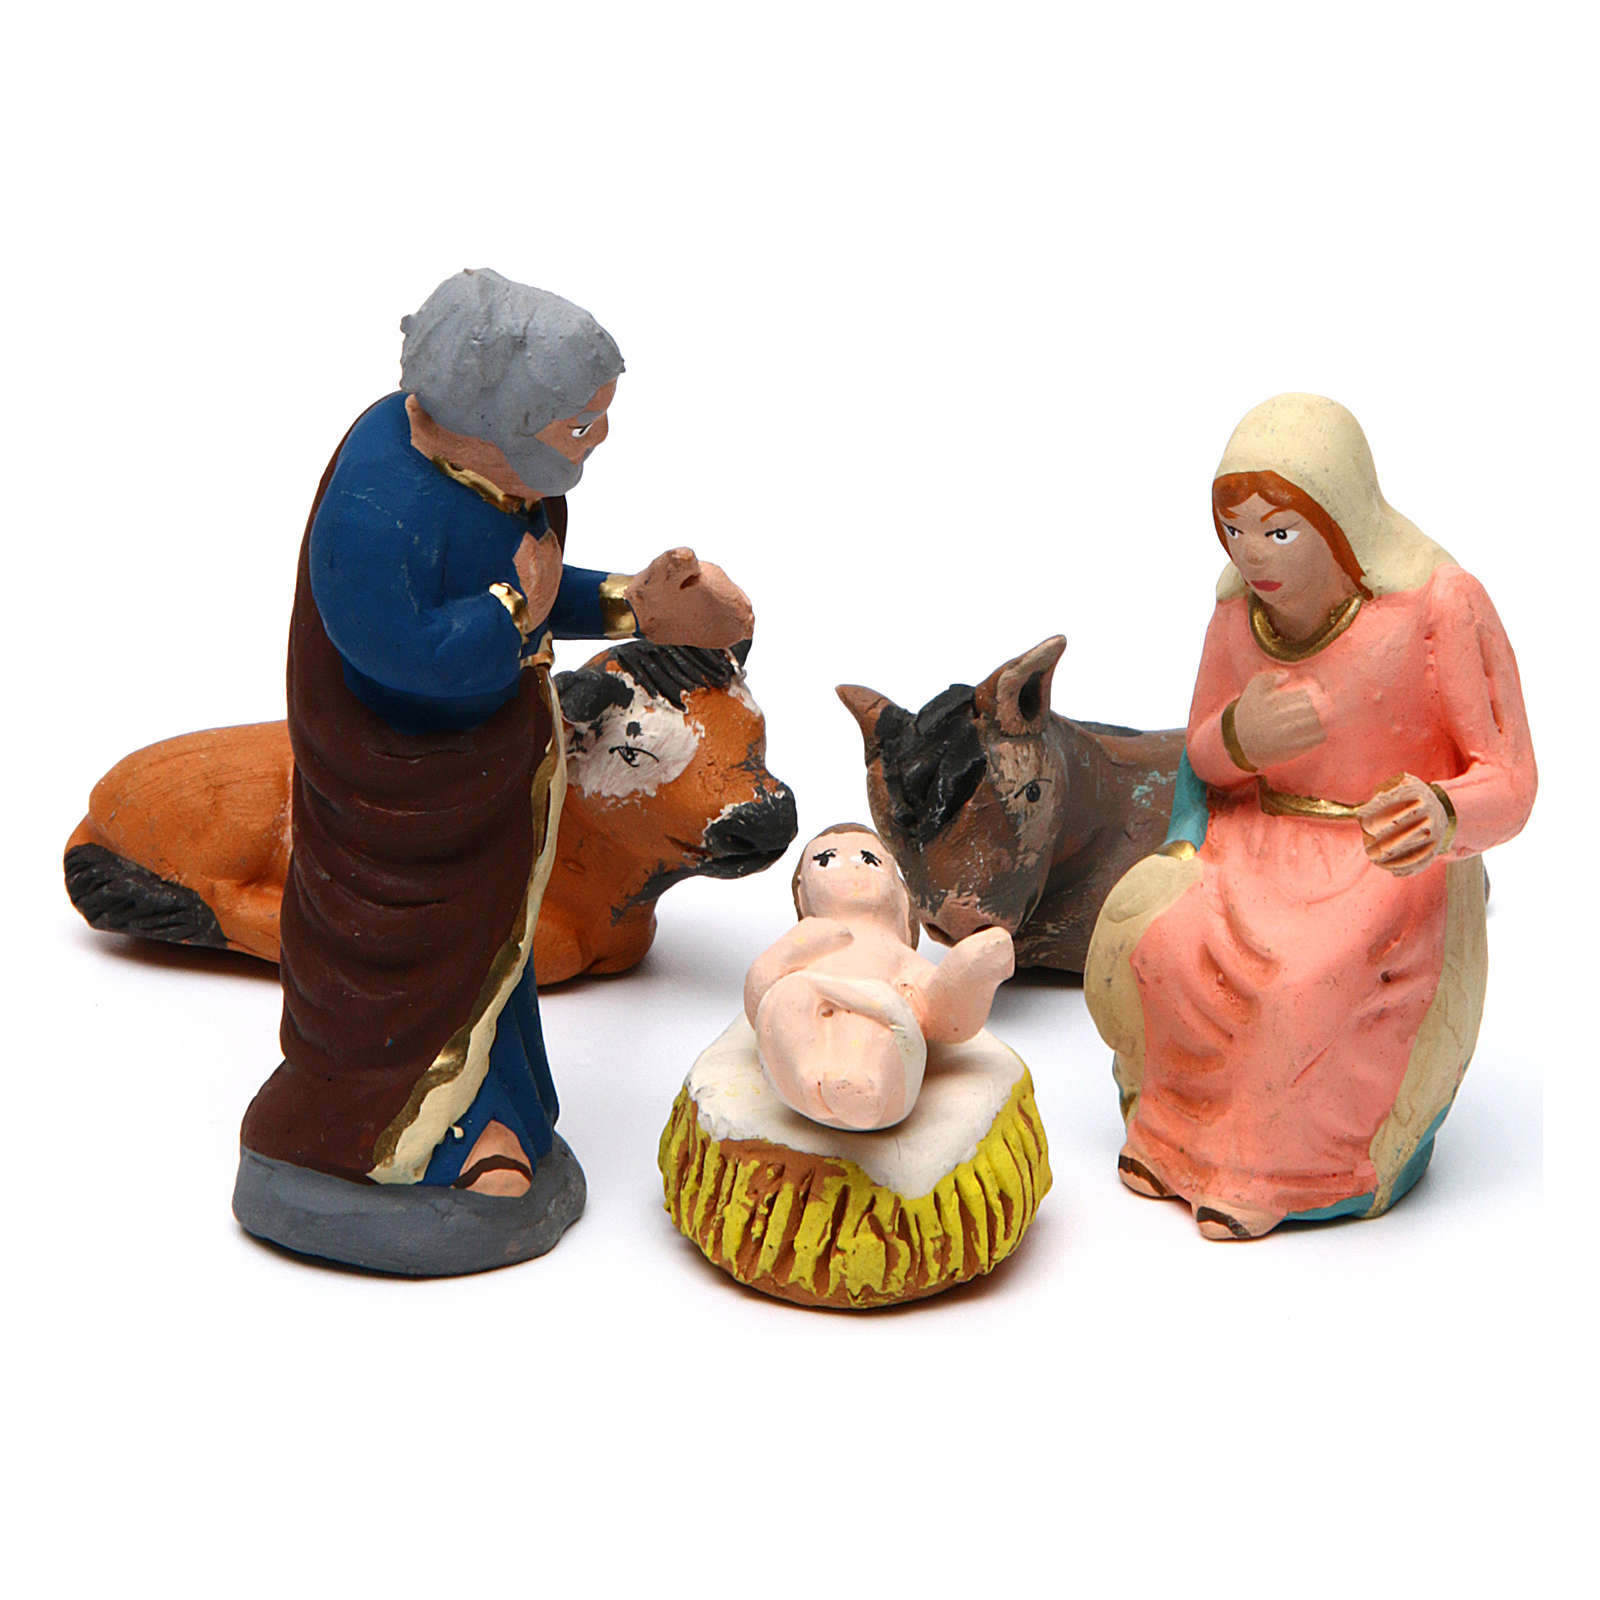 Nativity Scene 7 cm, set of 11 figurines hand painted 4